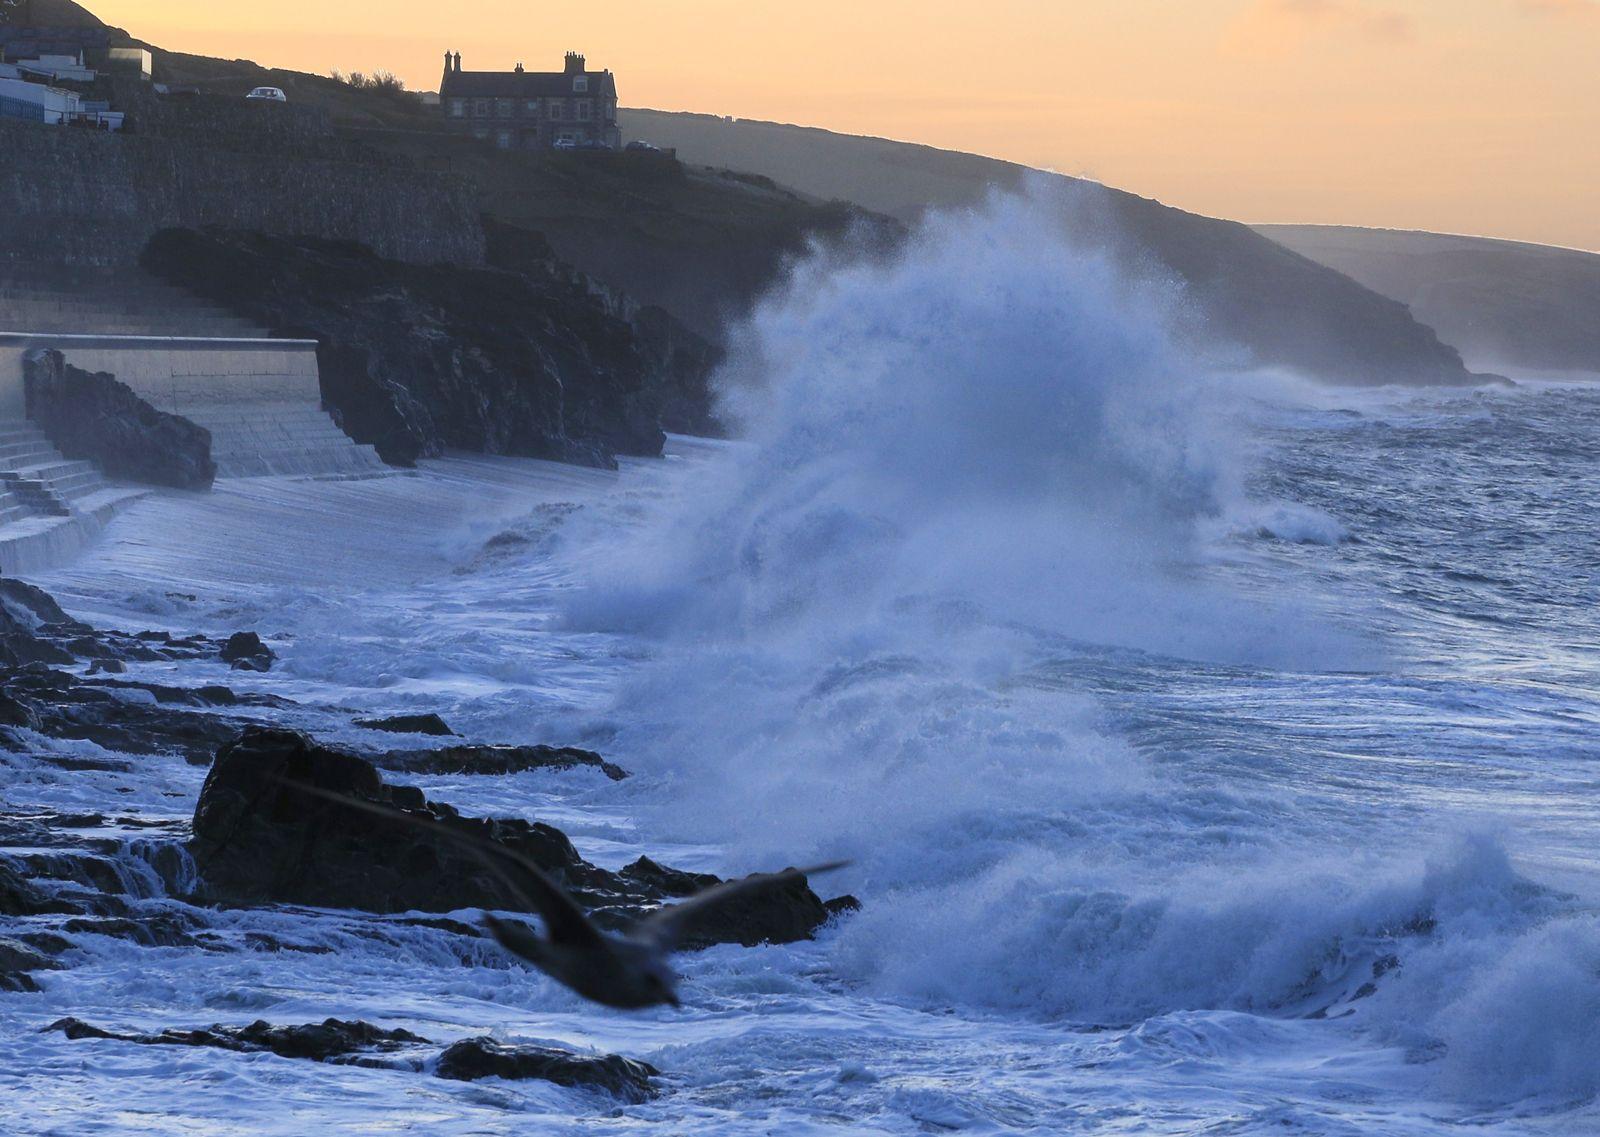 Stormy Seas - Wendy